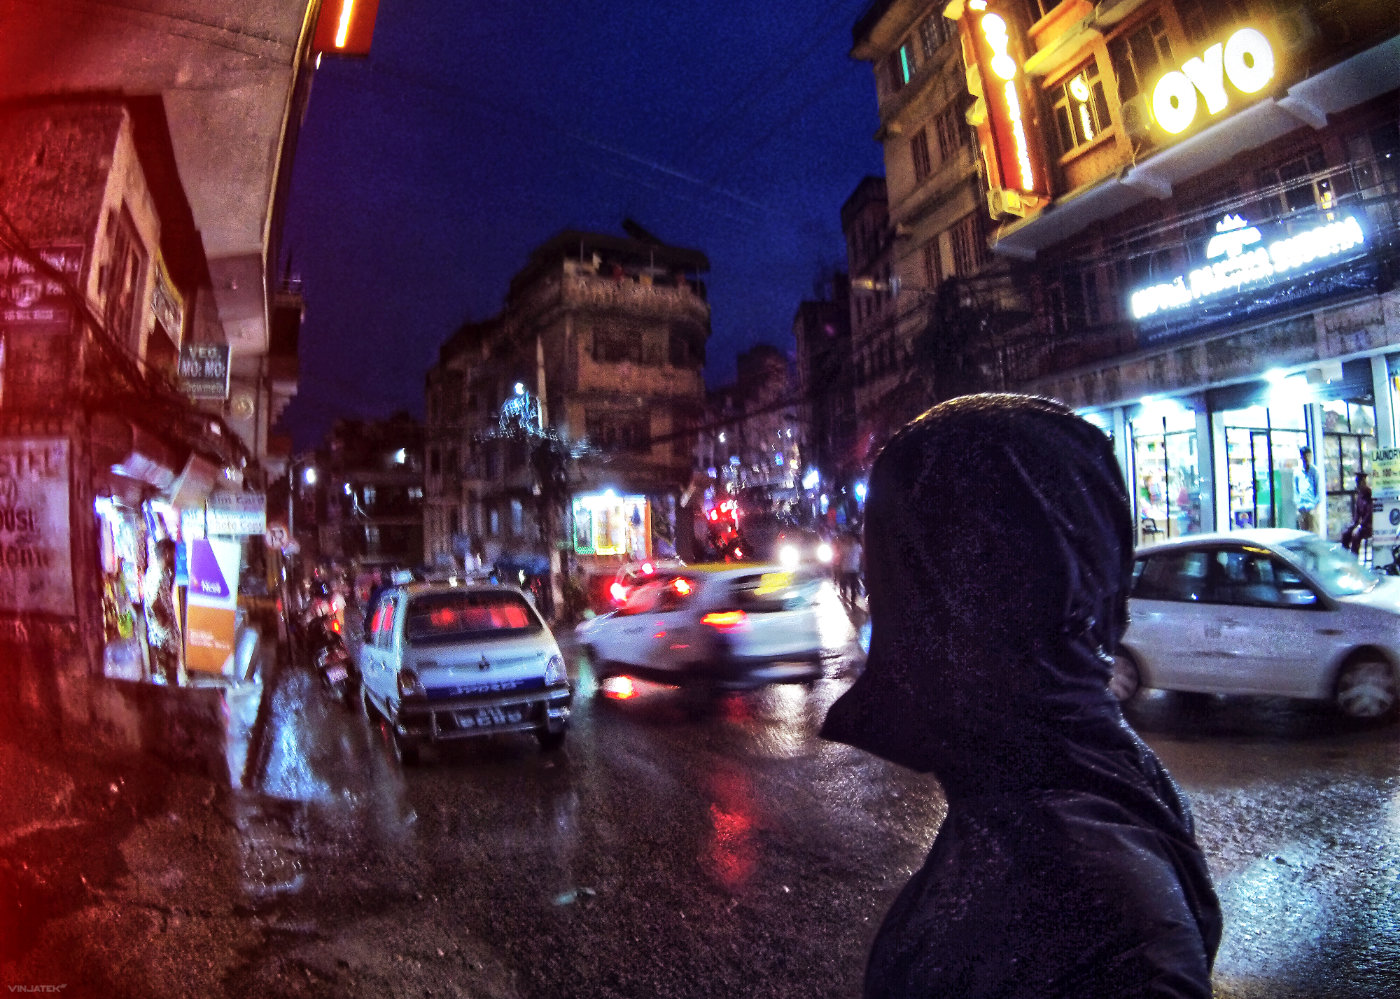 Chaos in The Streets of Kathmandu, Nepal /// Vinjatek